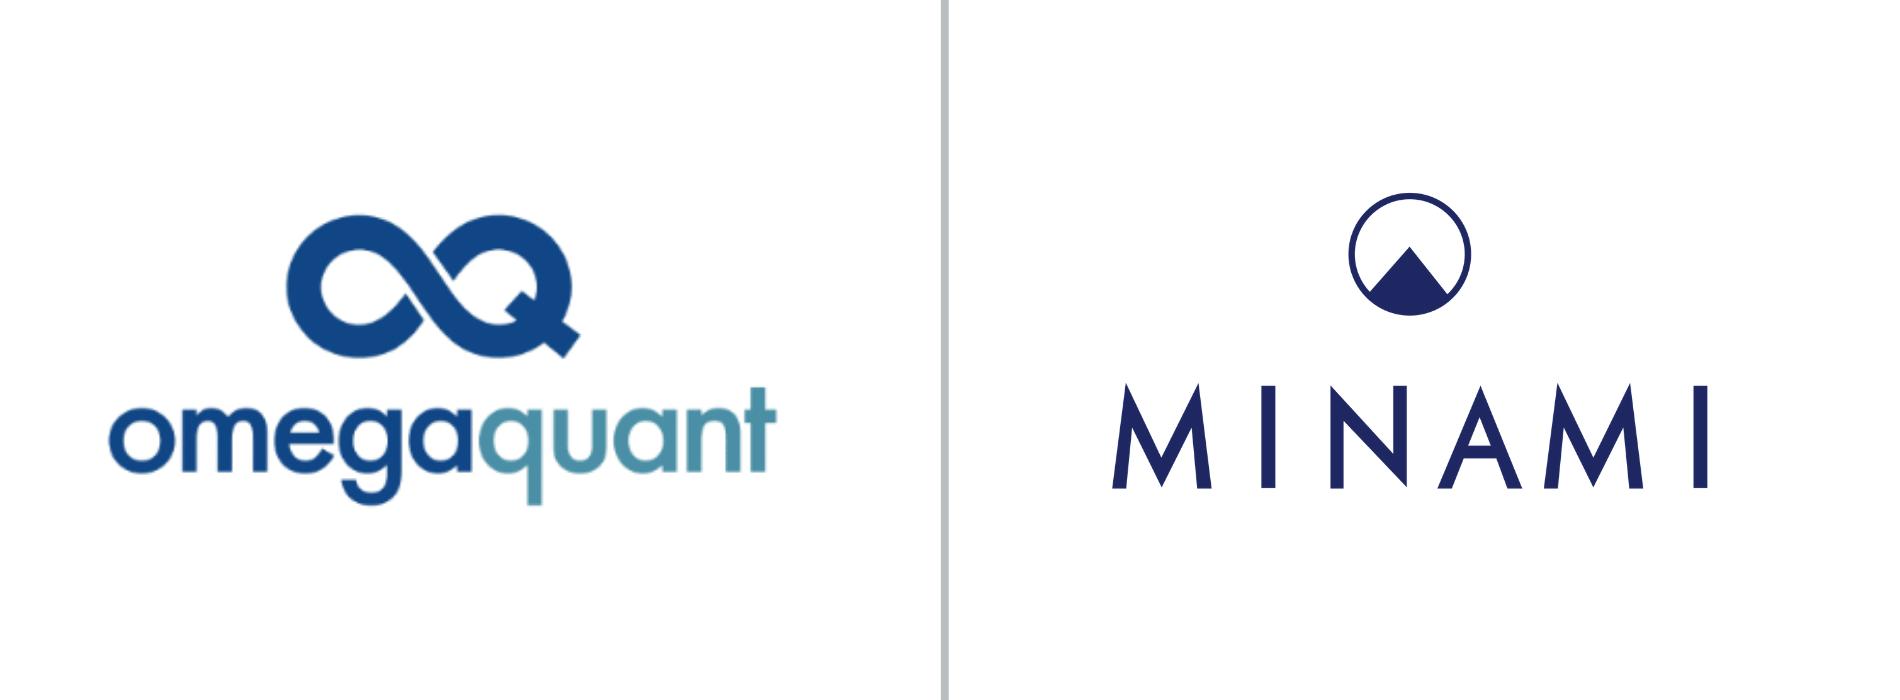 Omega Quant and Minami logo